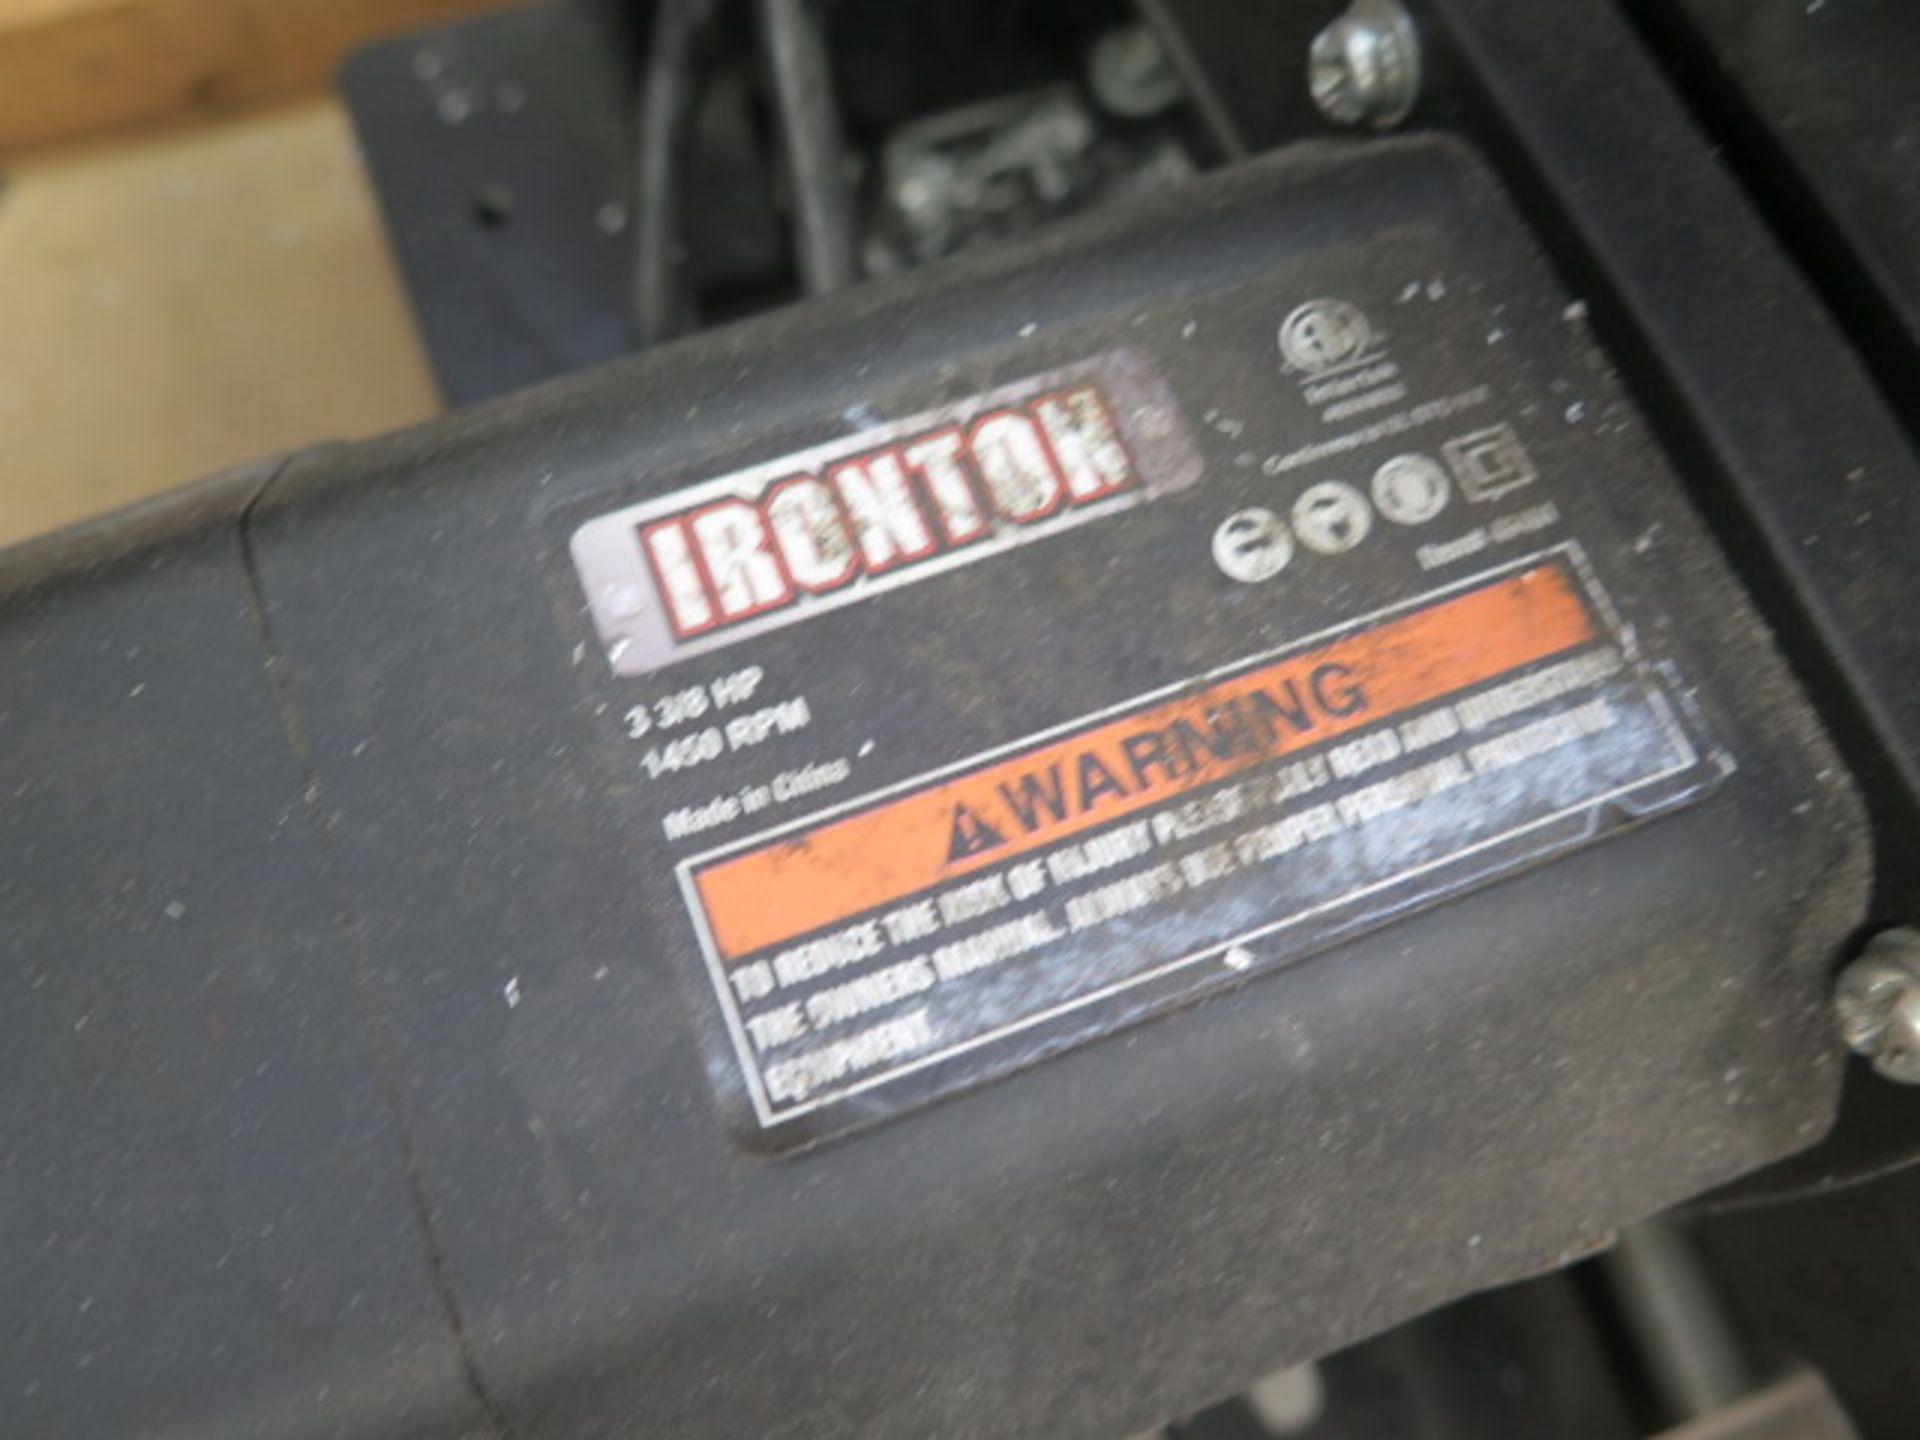 "Ironton 14"" Cutoff Saw (SOLD AS-IS - NO WARRANTY) - Image 6 of 6"